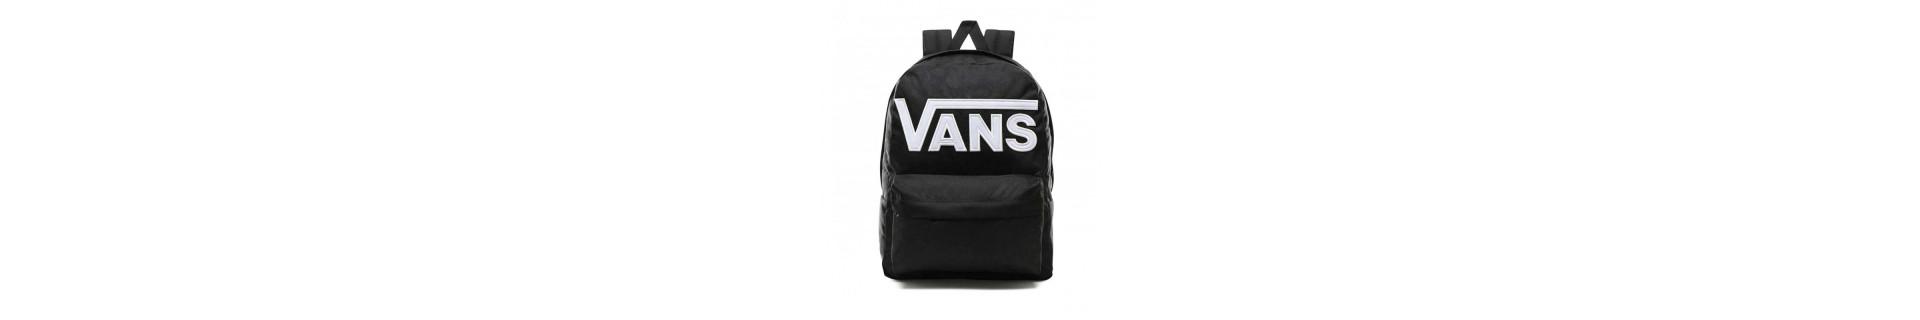 Bolsos, mochilas, maletas gymsacks, adidas, vans, joma, puma, valisa